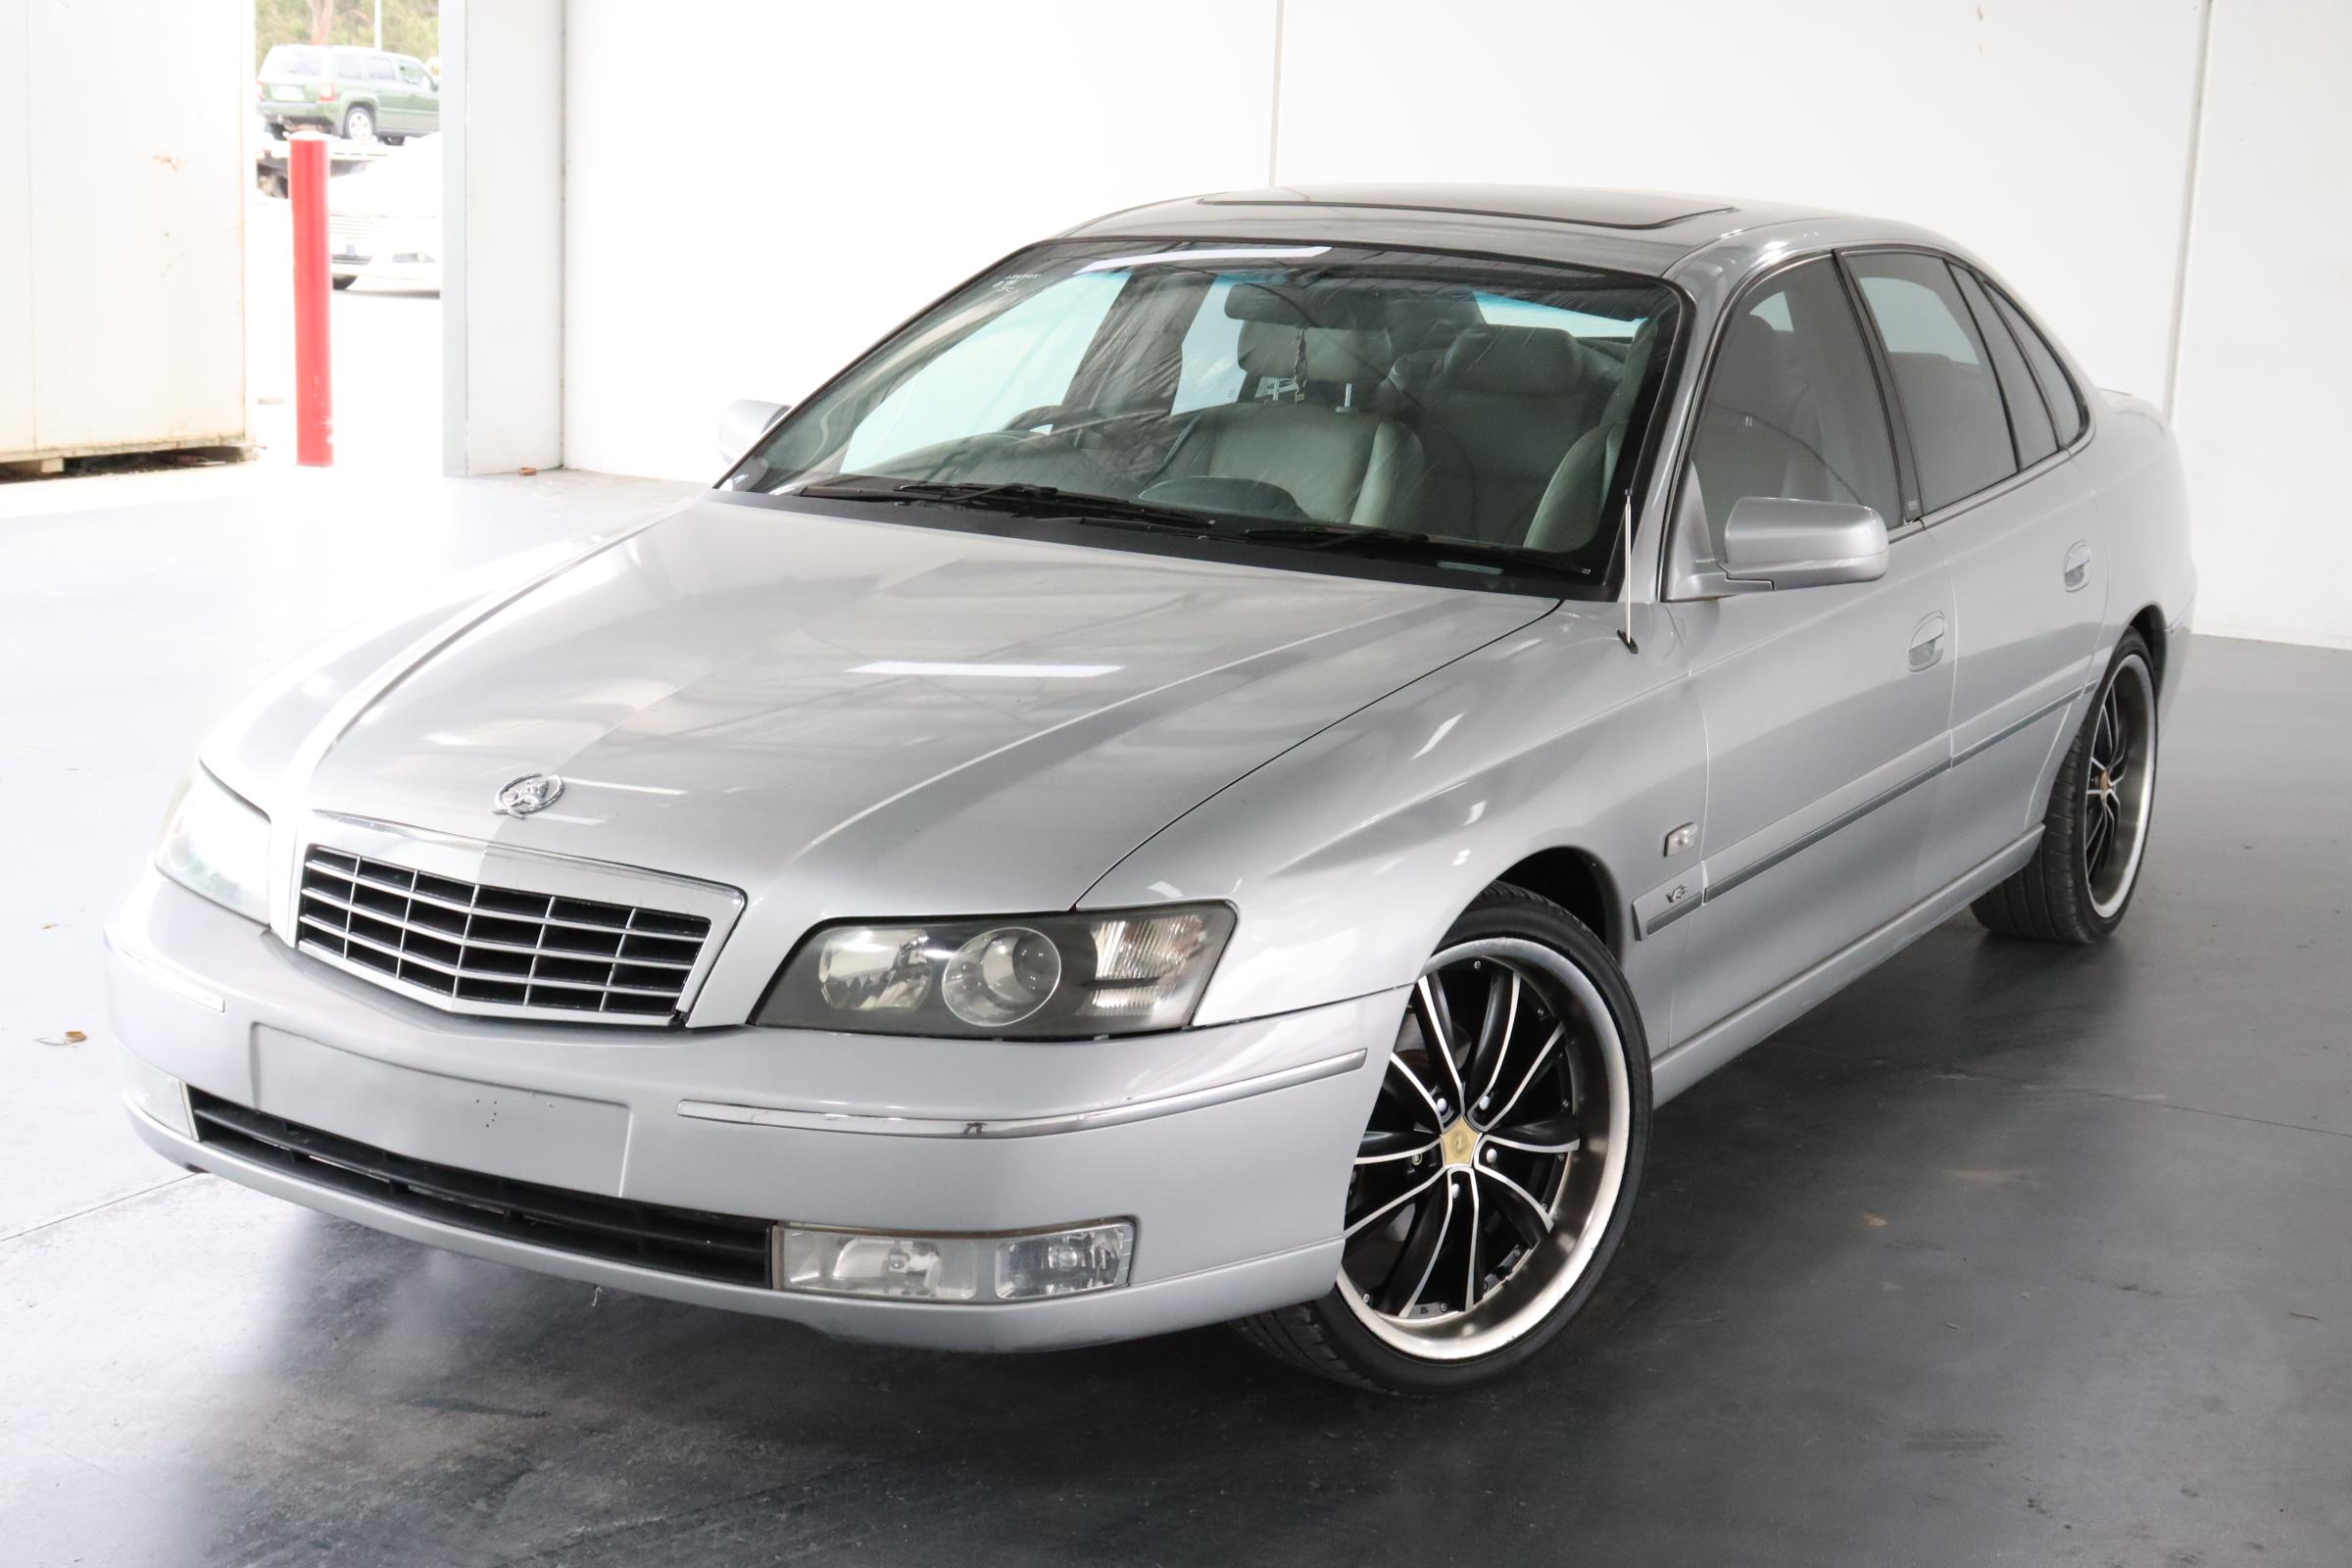 2005 Holden Statesman International WL Automatic Sedan